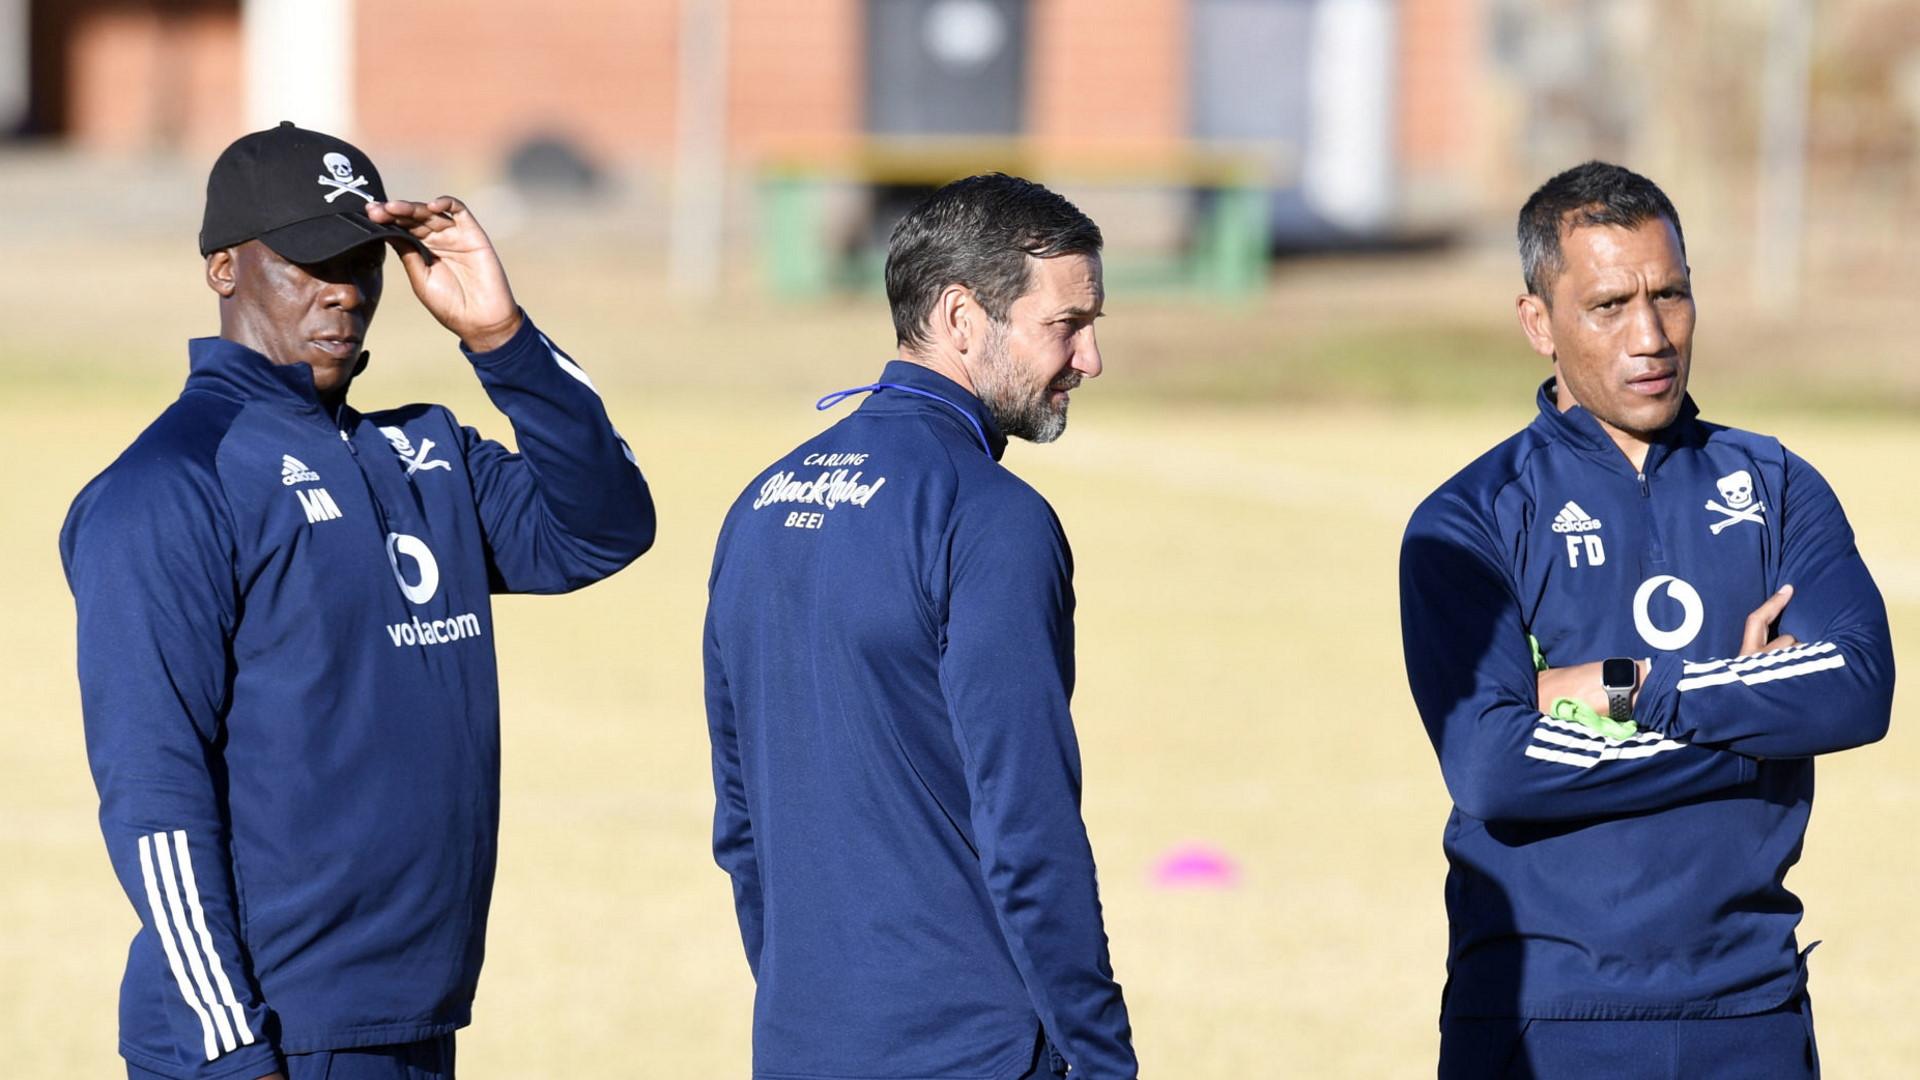 Orlando Pirates legend Motale insists 'local is lekker' as he backs Ncikazi & Davids to replace Zinnbauer